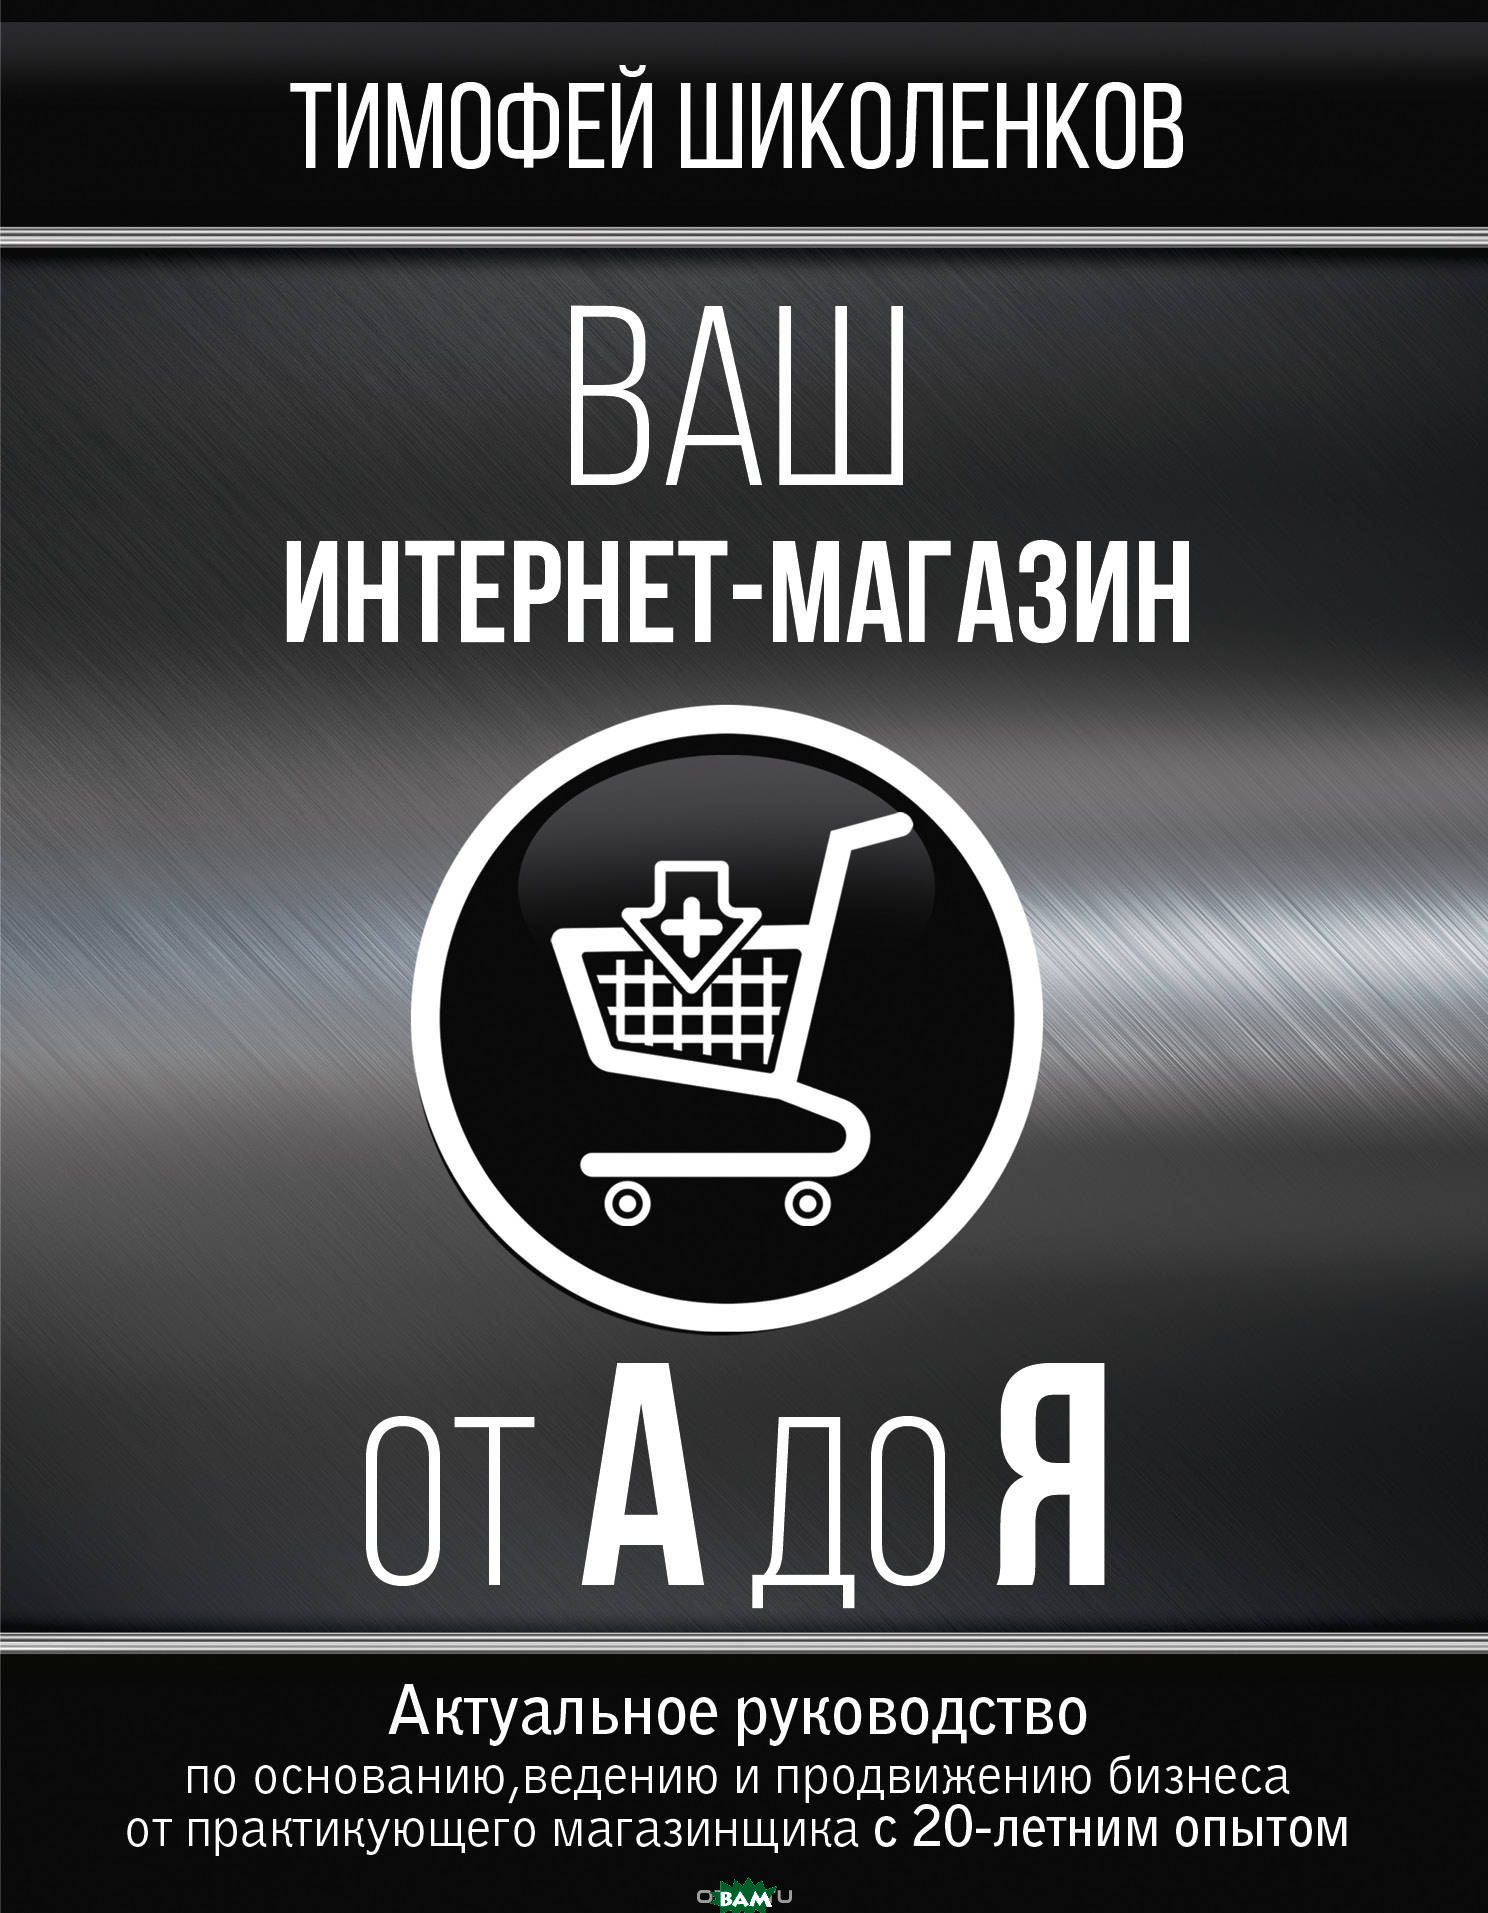 Шиколенков Тимофей / Ваш интернет-магазин от А до Я